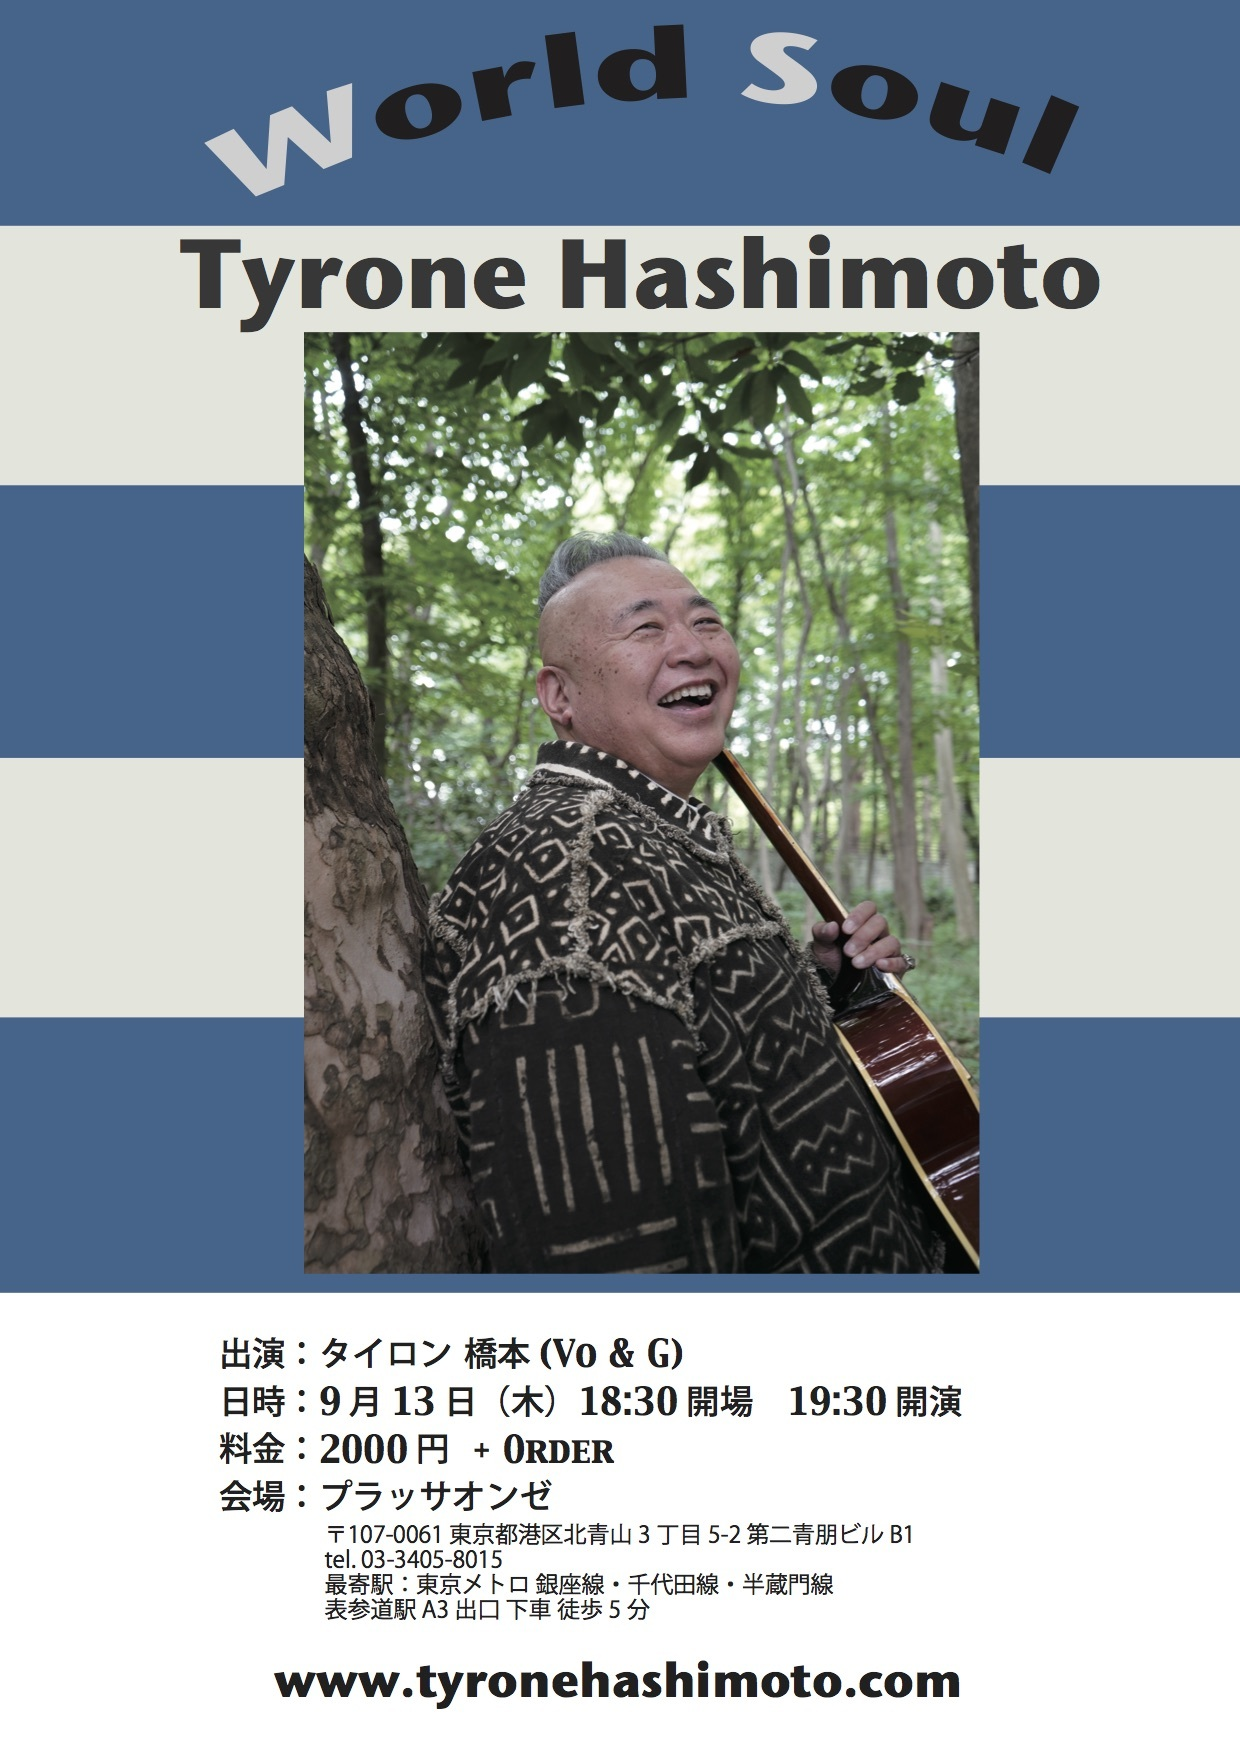 Tyrone Hashimoto 9月 ライブ情報_c0368808_03542500.jpg